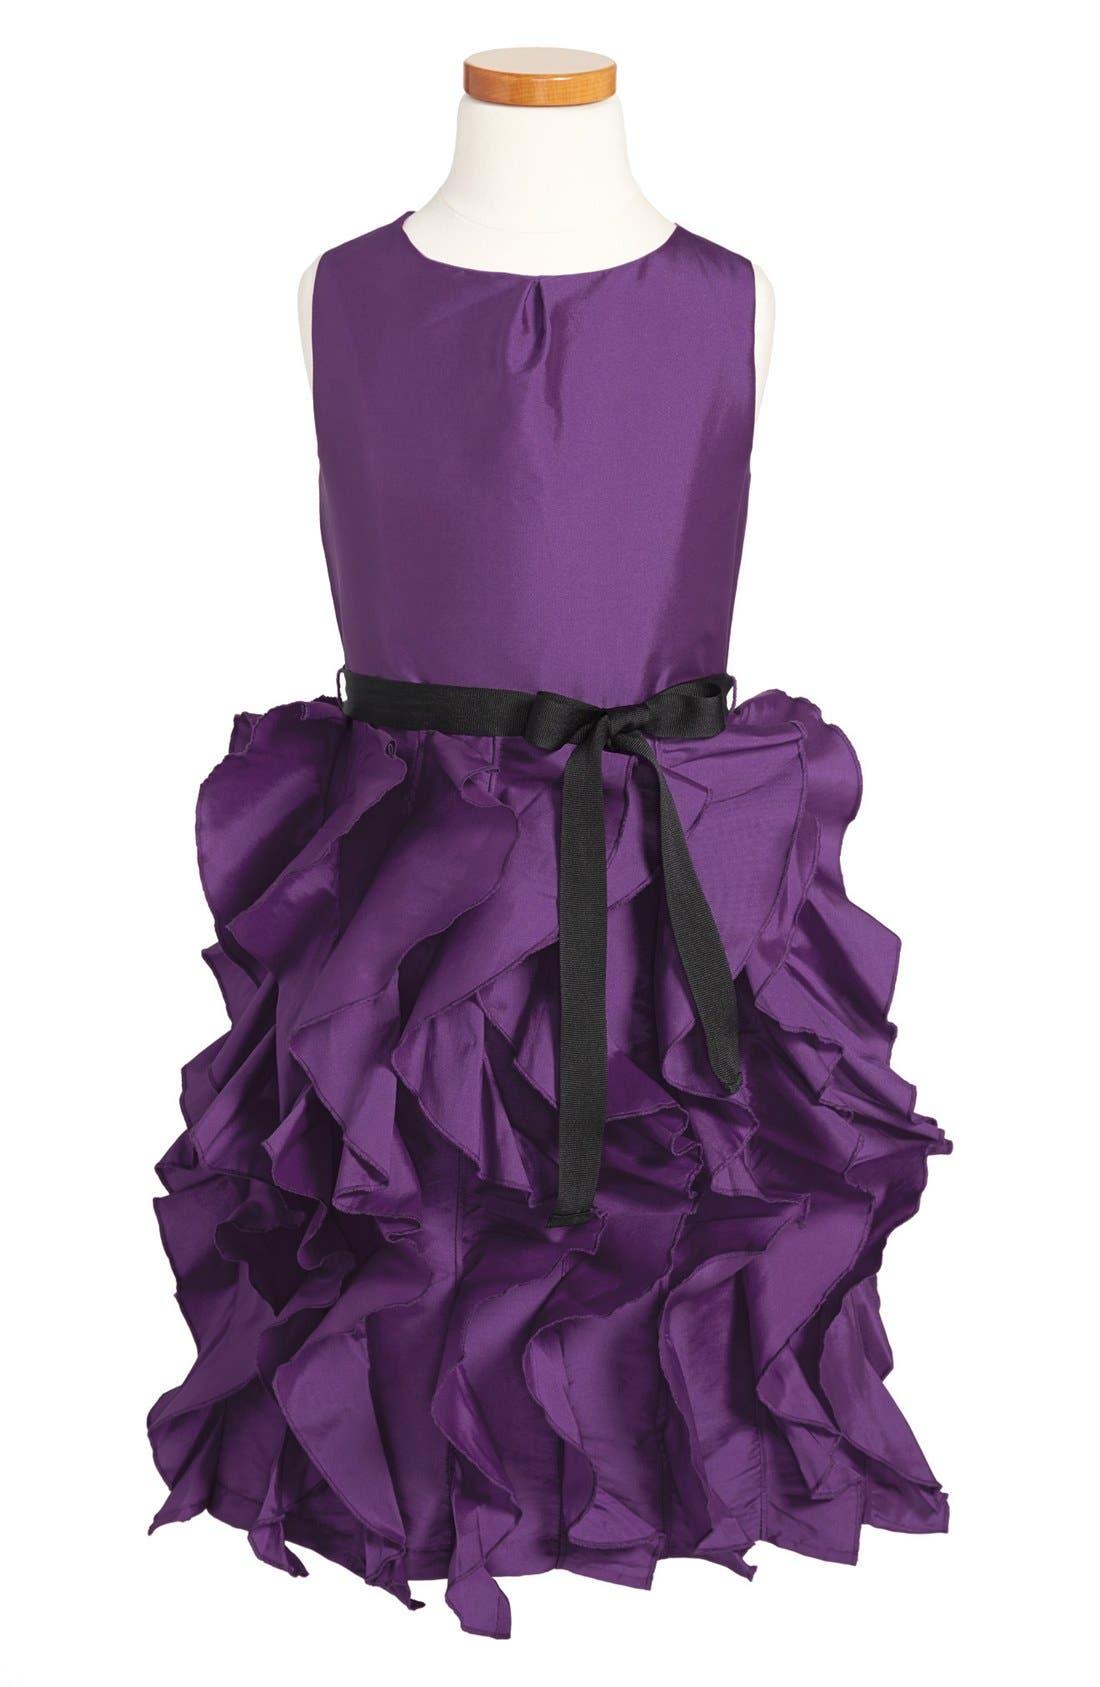 Alternate Image 1 Selected - Us Angels Ruffle Skirt Sleeveless Dress (Little Girls & Big Girls)